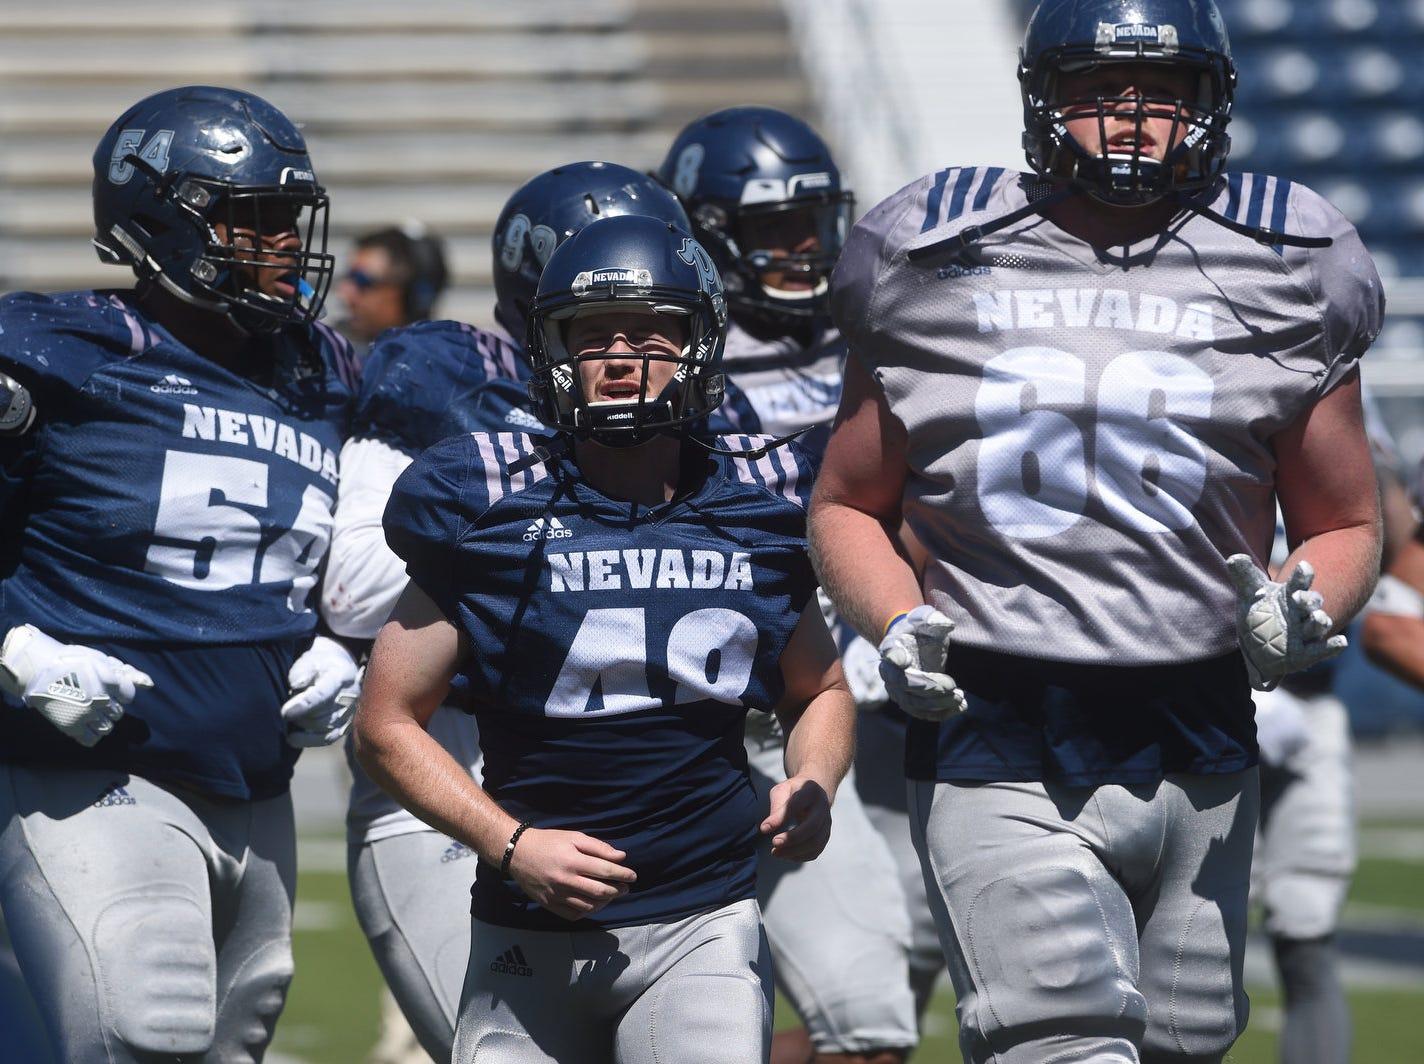 Nevada Football's annual spring game at Mackay Stadium in Reno on April 27, 2019.